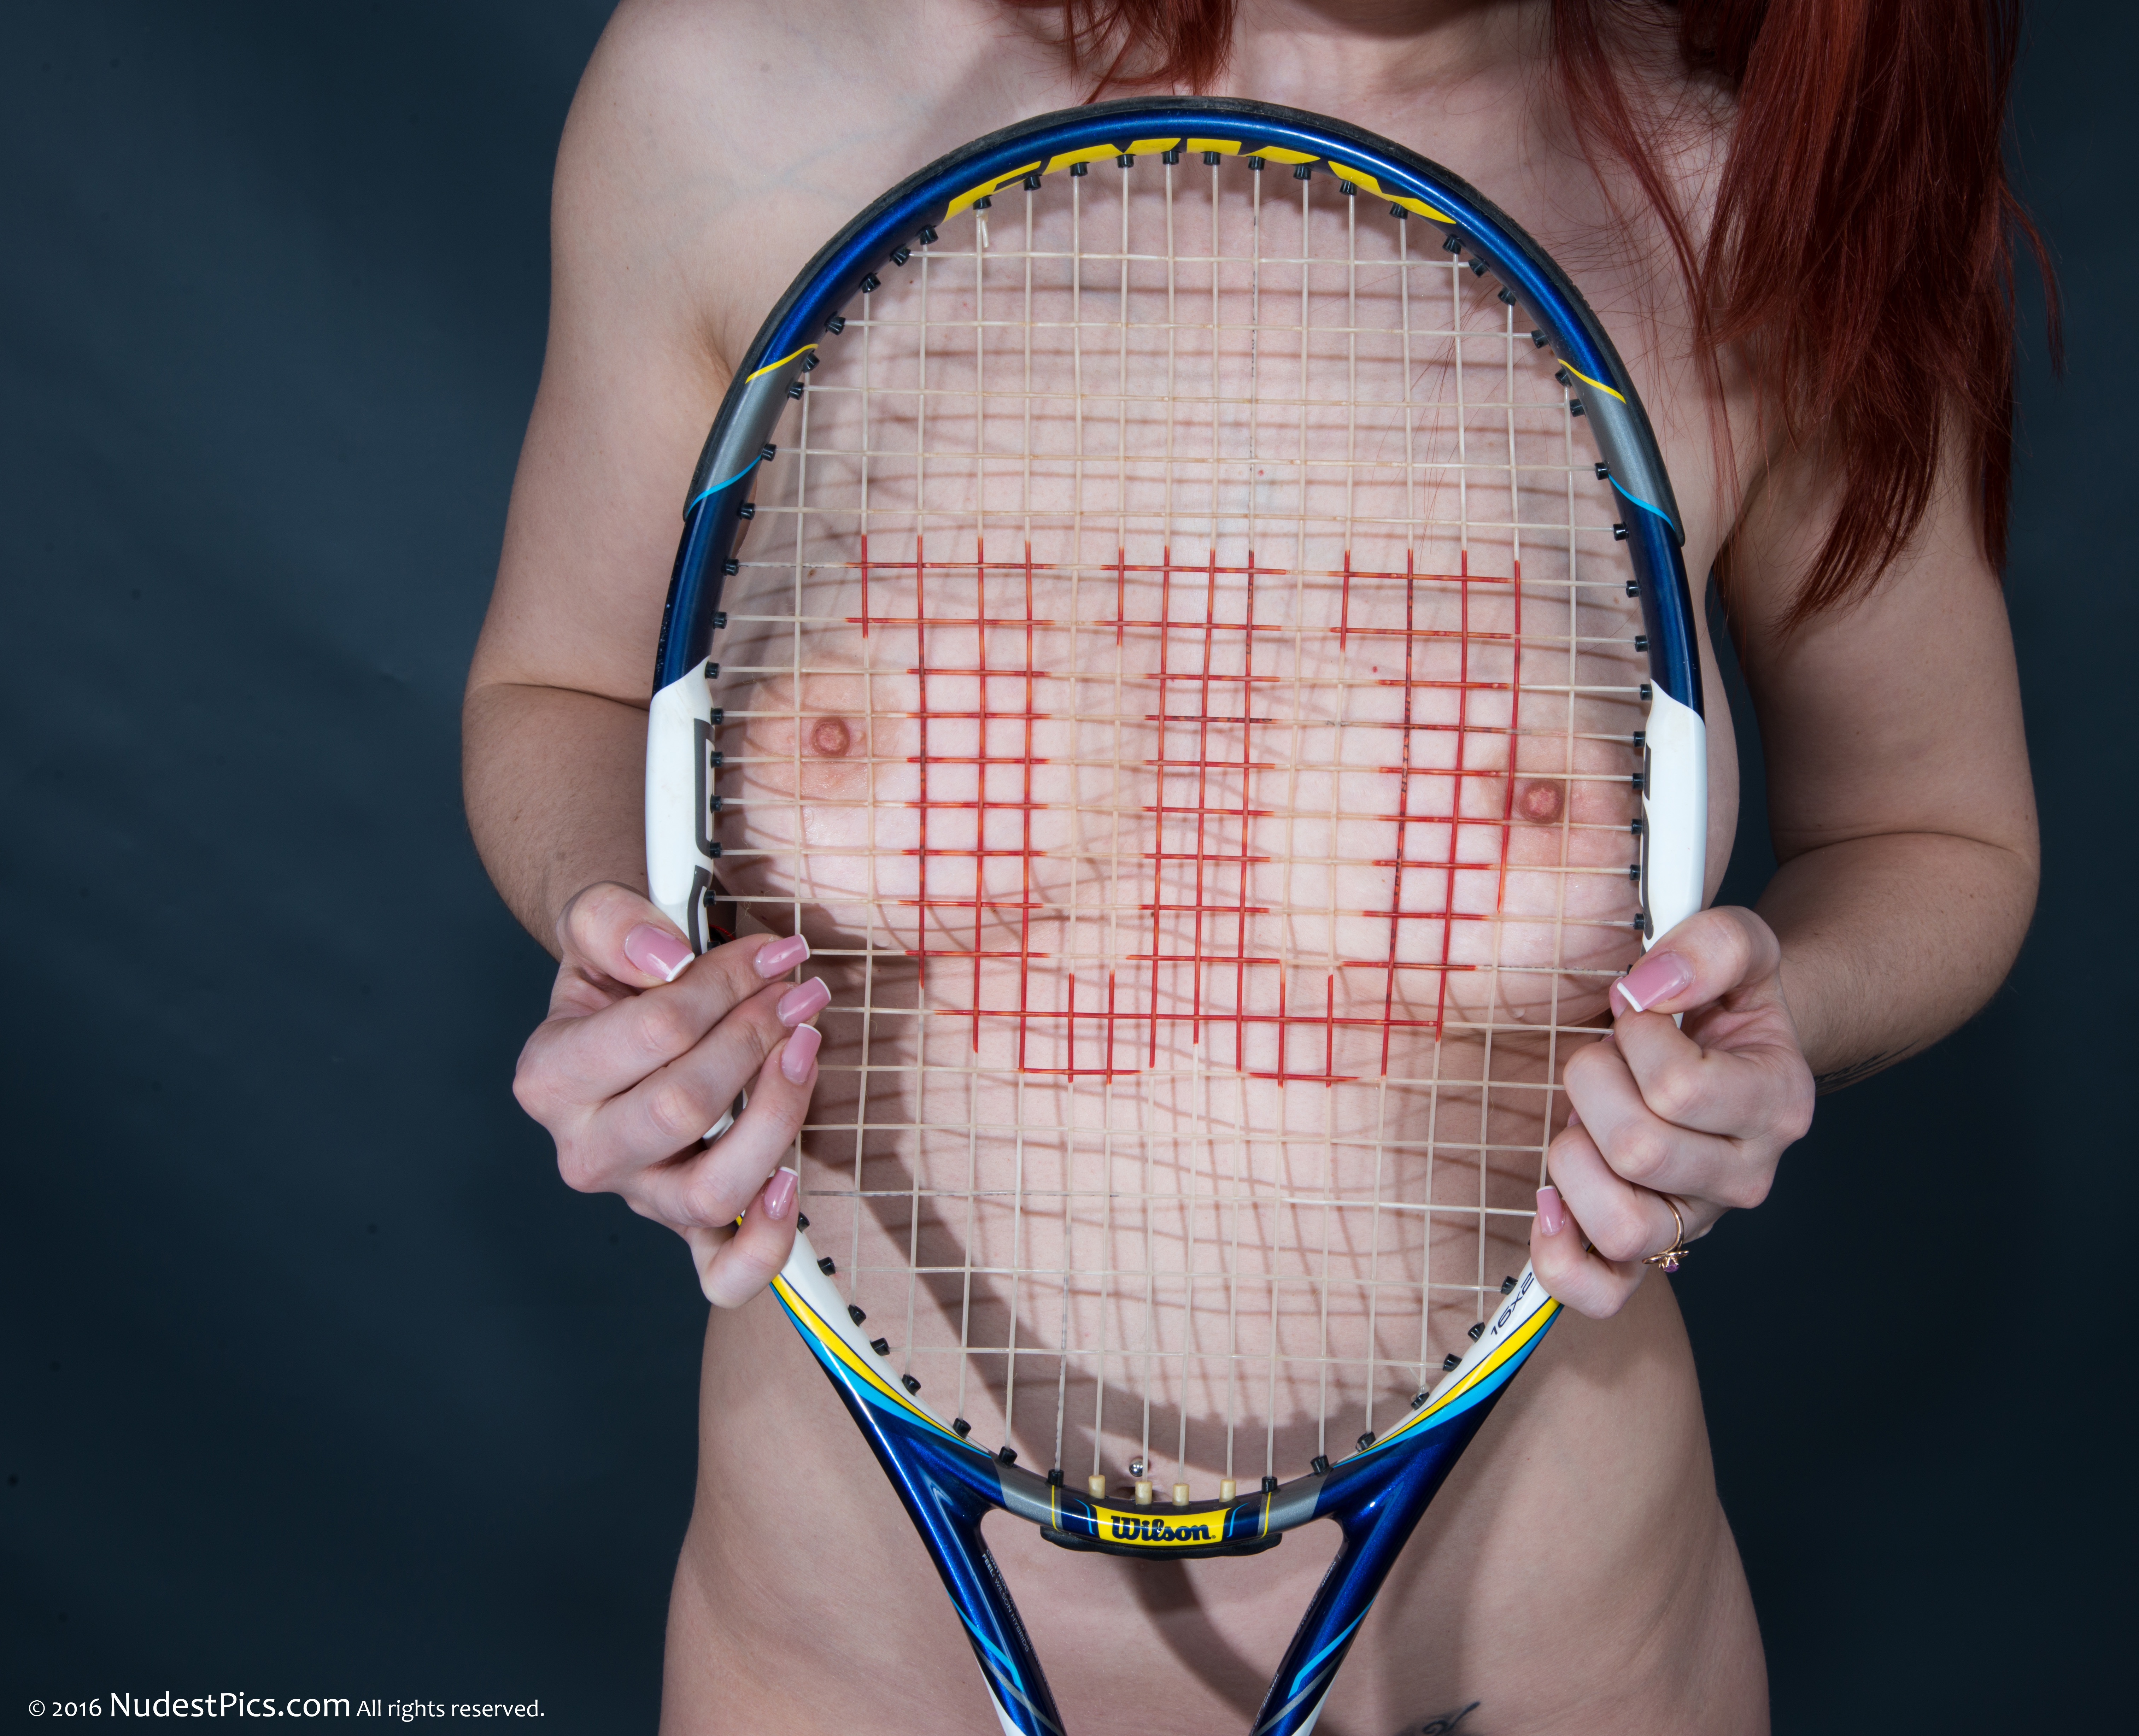 Tennis Racket Pressing on Breasts HD